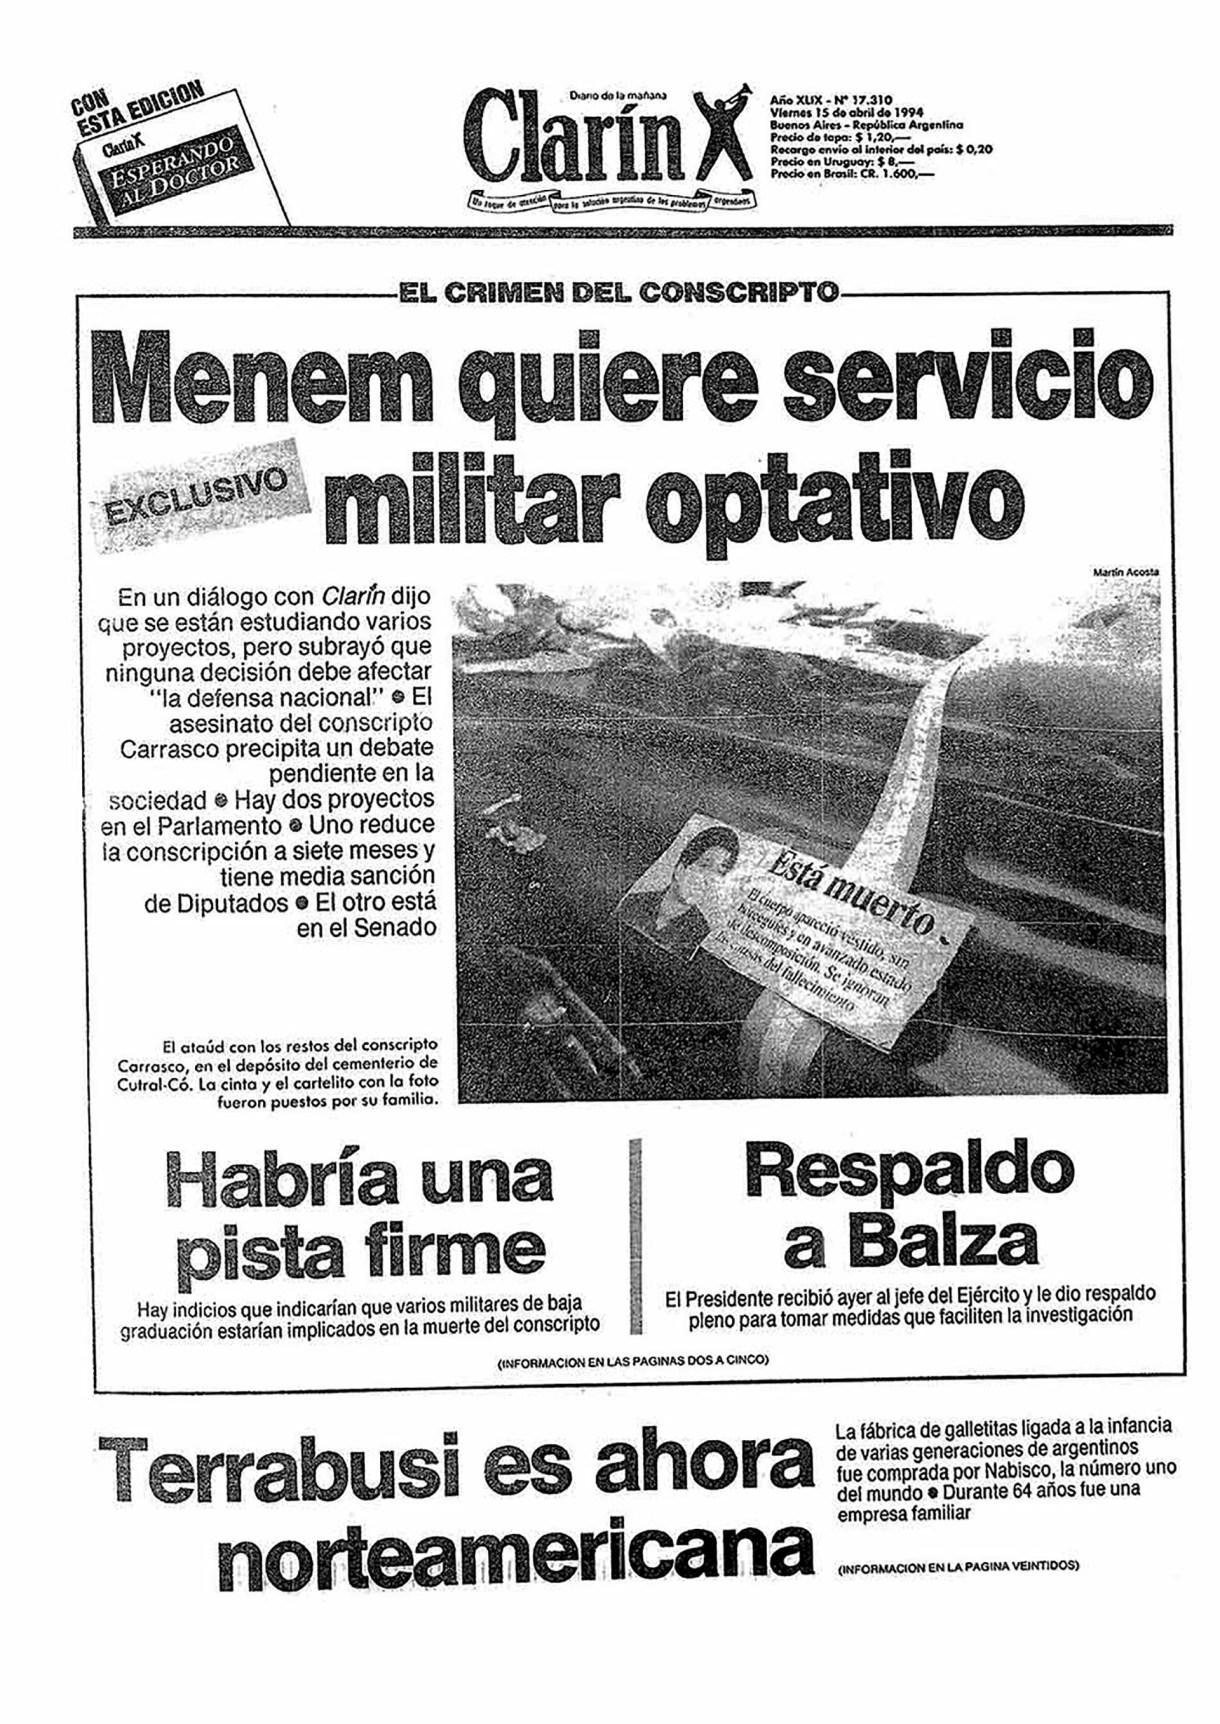 Clarin caso carrasco SF 14 abril 1994